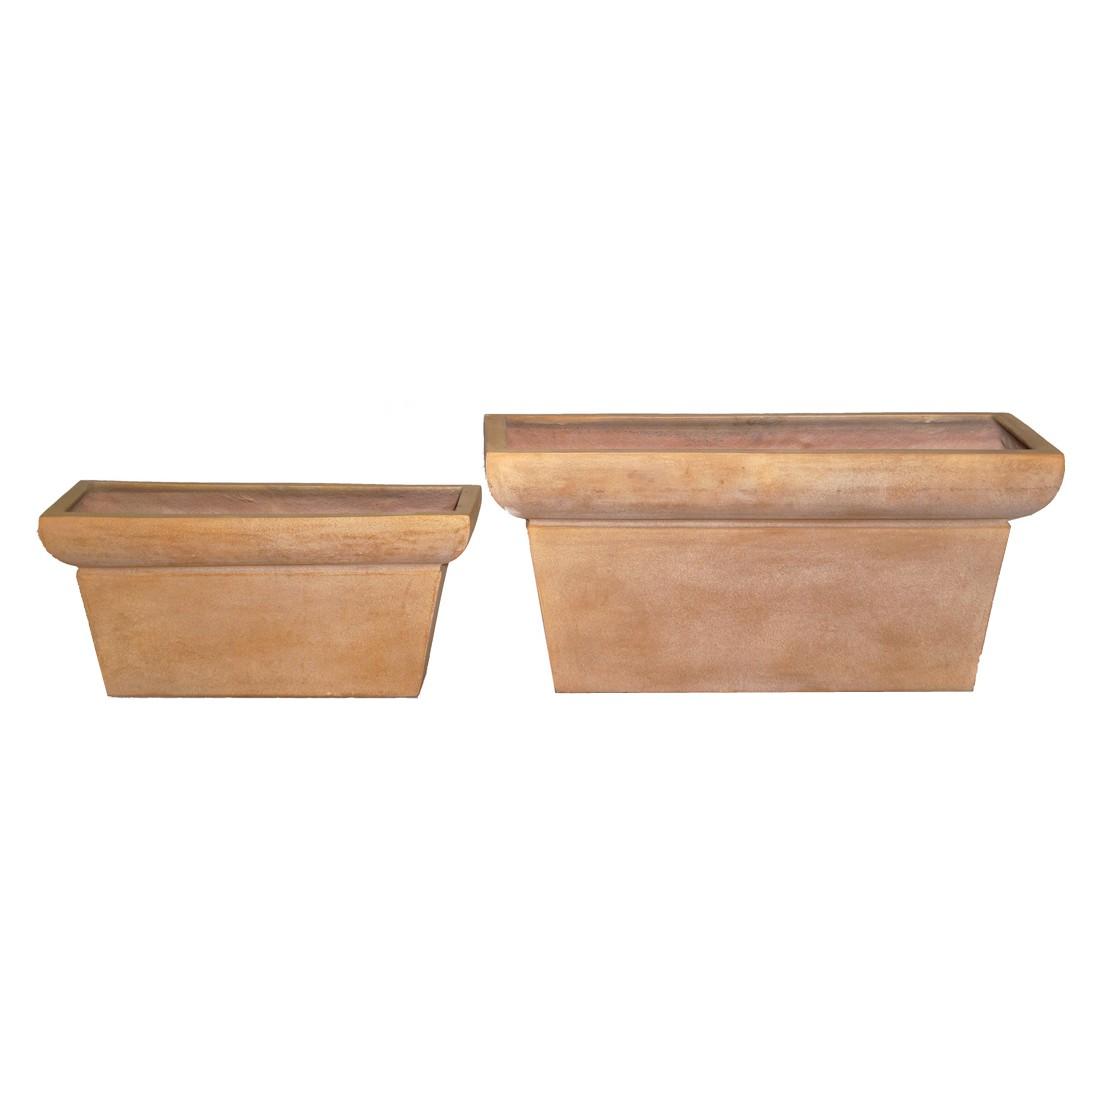 Blumenkasten ISI Cotto – Kunststoff – Terracota – Design Eckig – 45 cm 20 cm Tiefe: 27 cm, Viducci's Garden bestellen